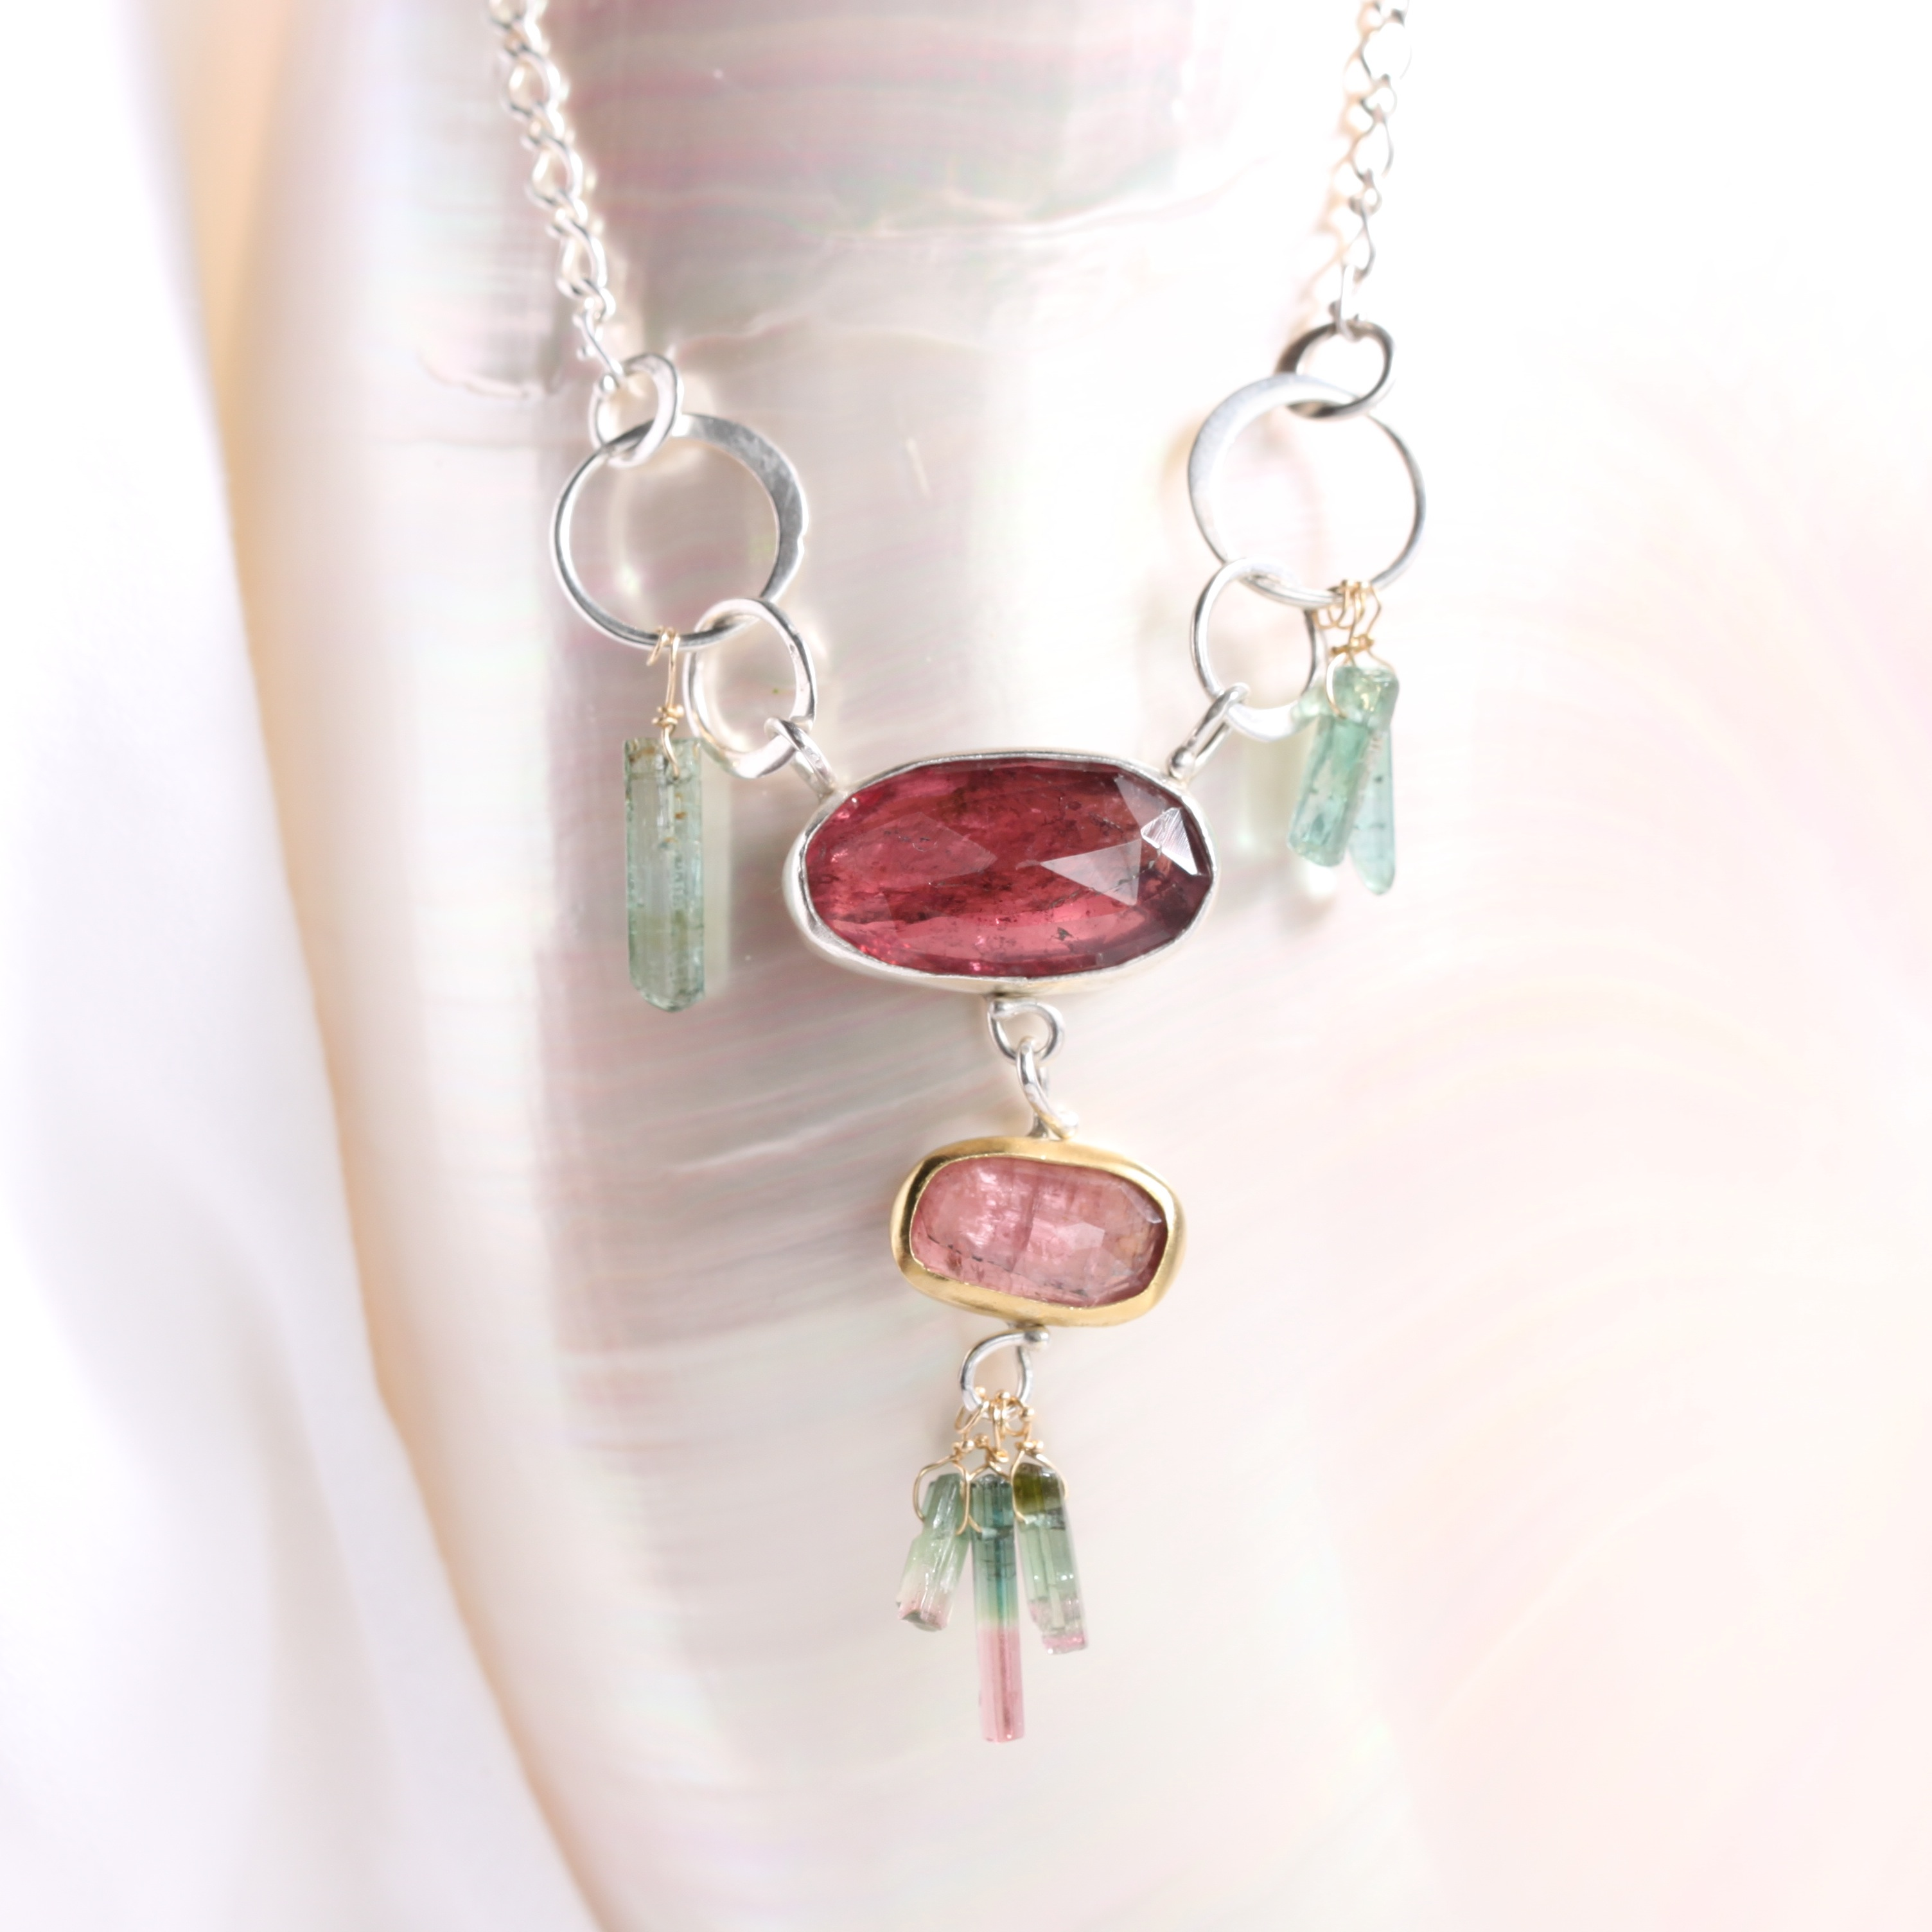 Rose Cut Pink Tourmaline Necklace Pendant with Tourmaline Crystal Fringe